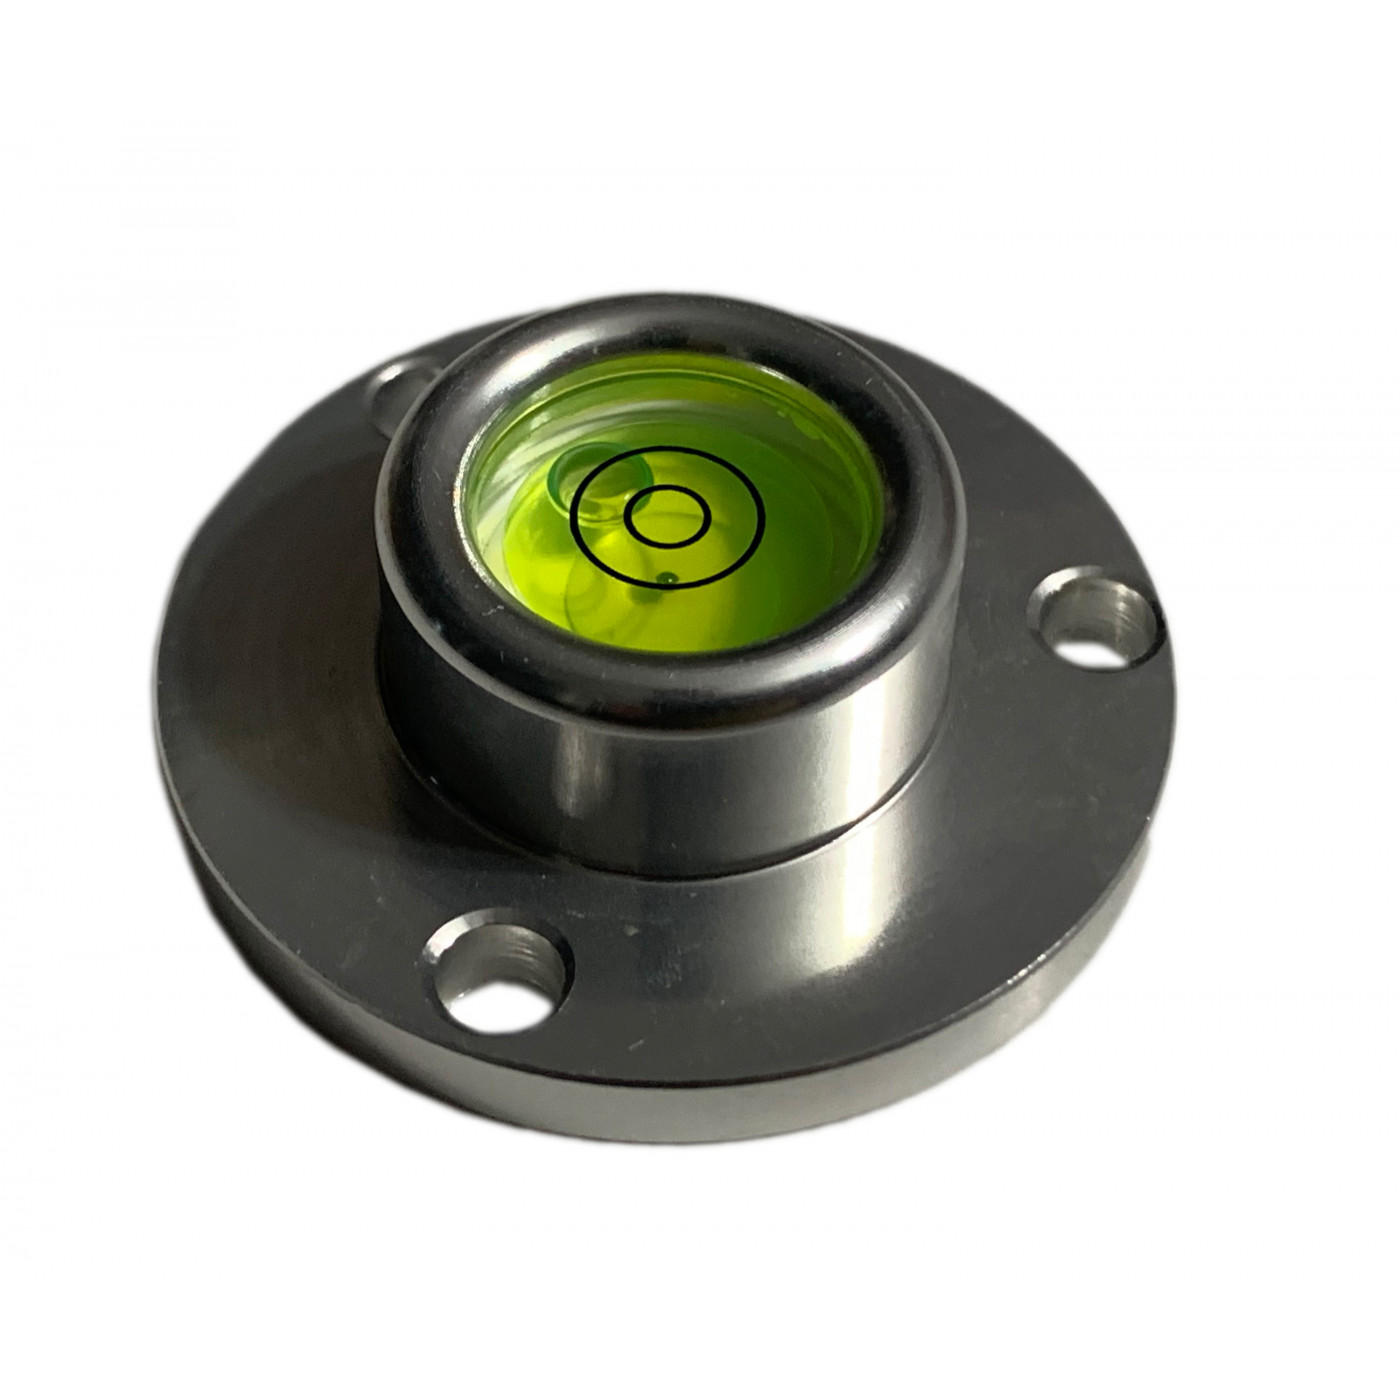 Ronde waterpas in aluminium behuizing (40x22x14 mm, zilver)